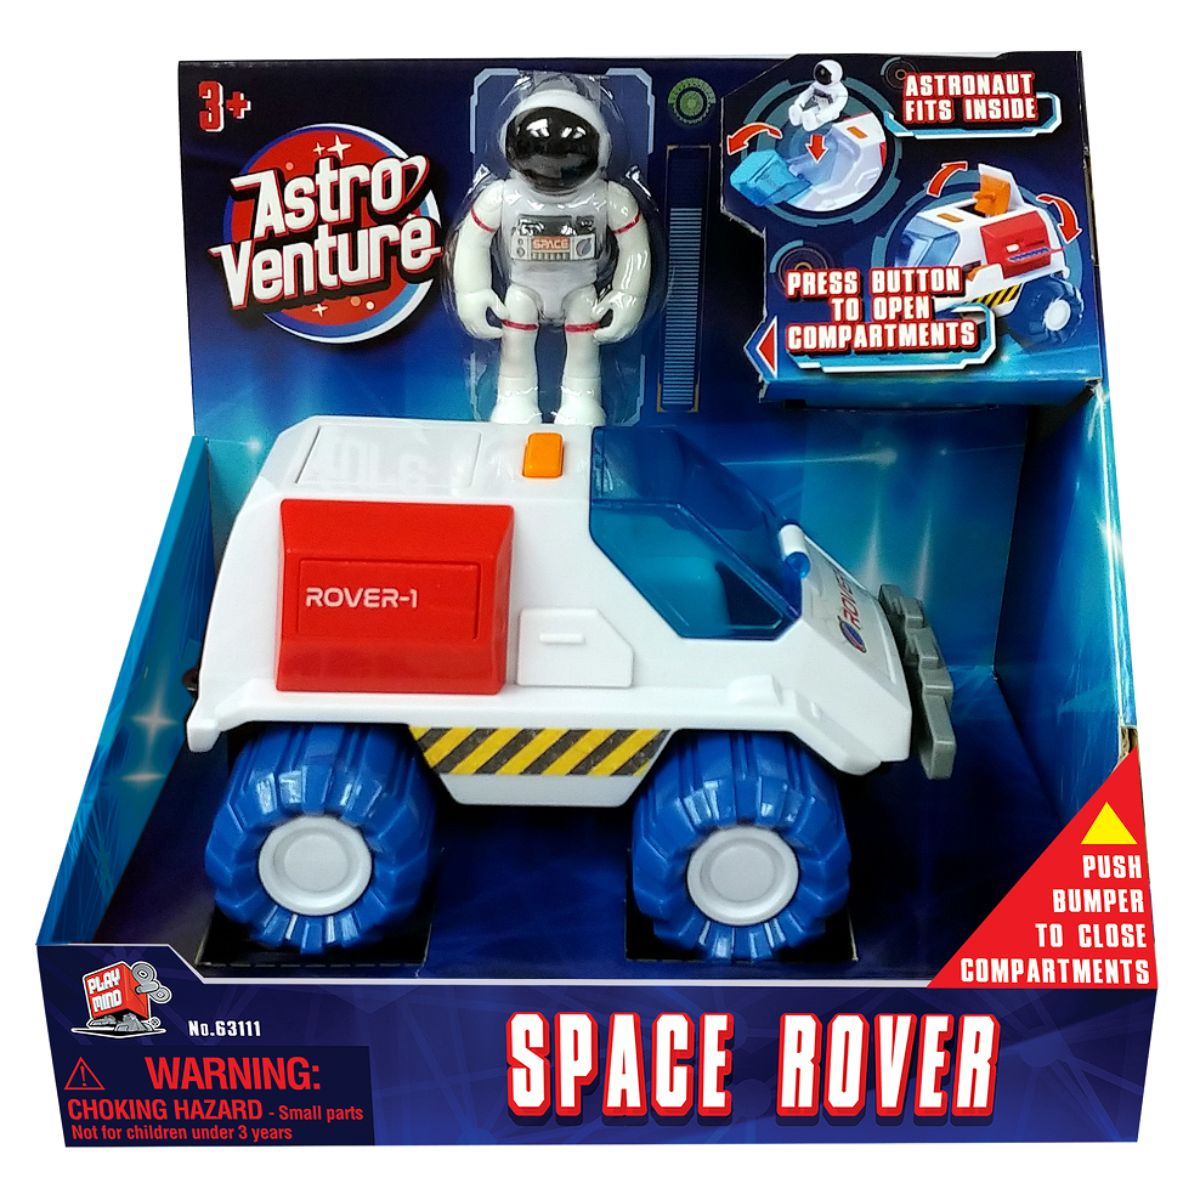 Vehicul spatial si figurina astronaut Astro Venture